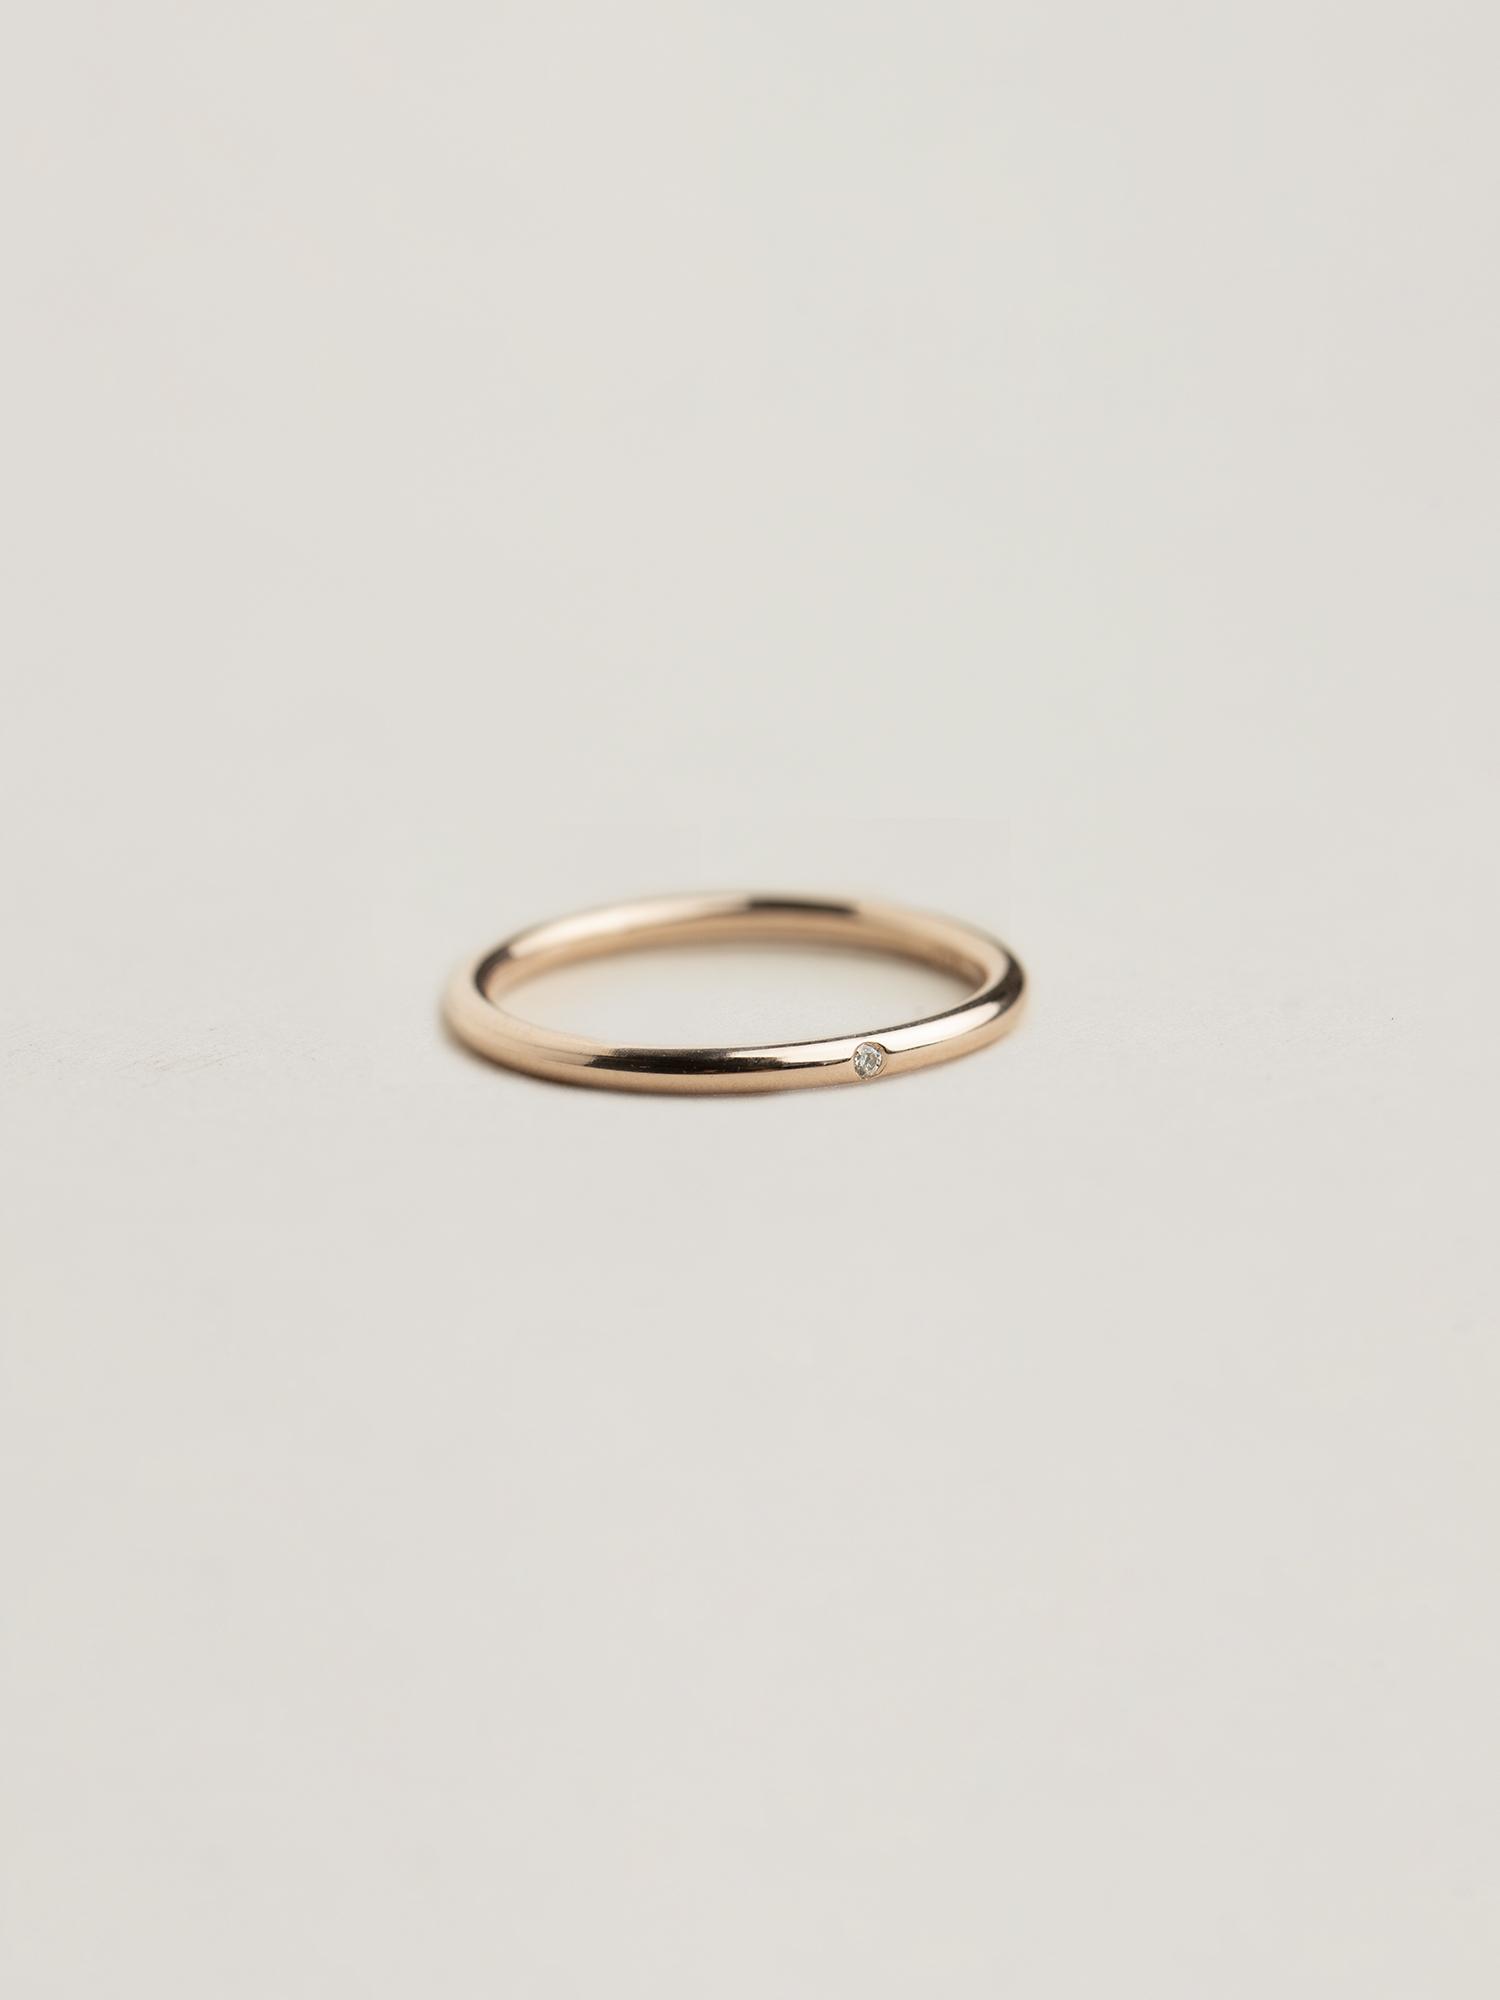 Christina-Pauls-Ring-zierlich-Diamant-Rosegold2.jpg